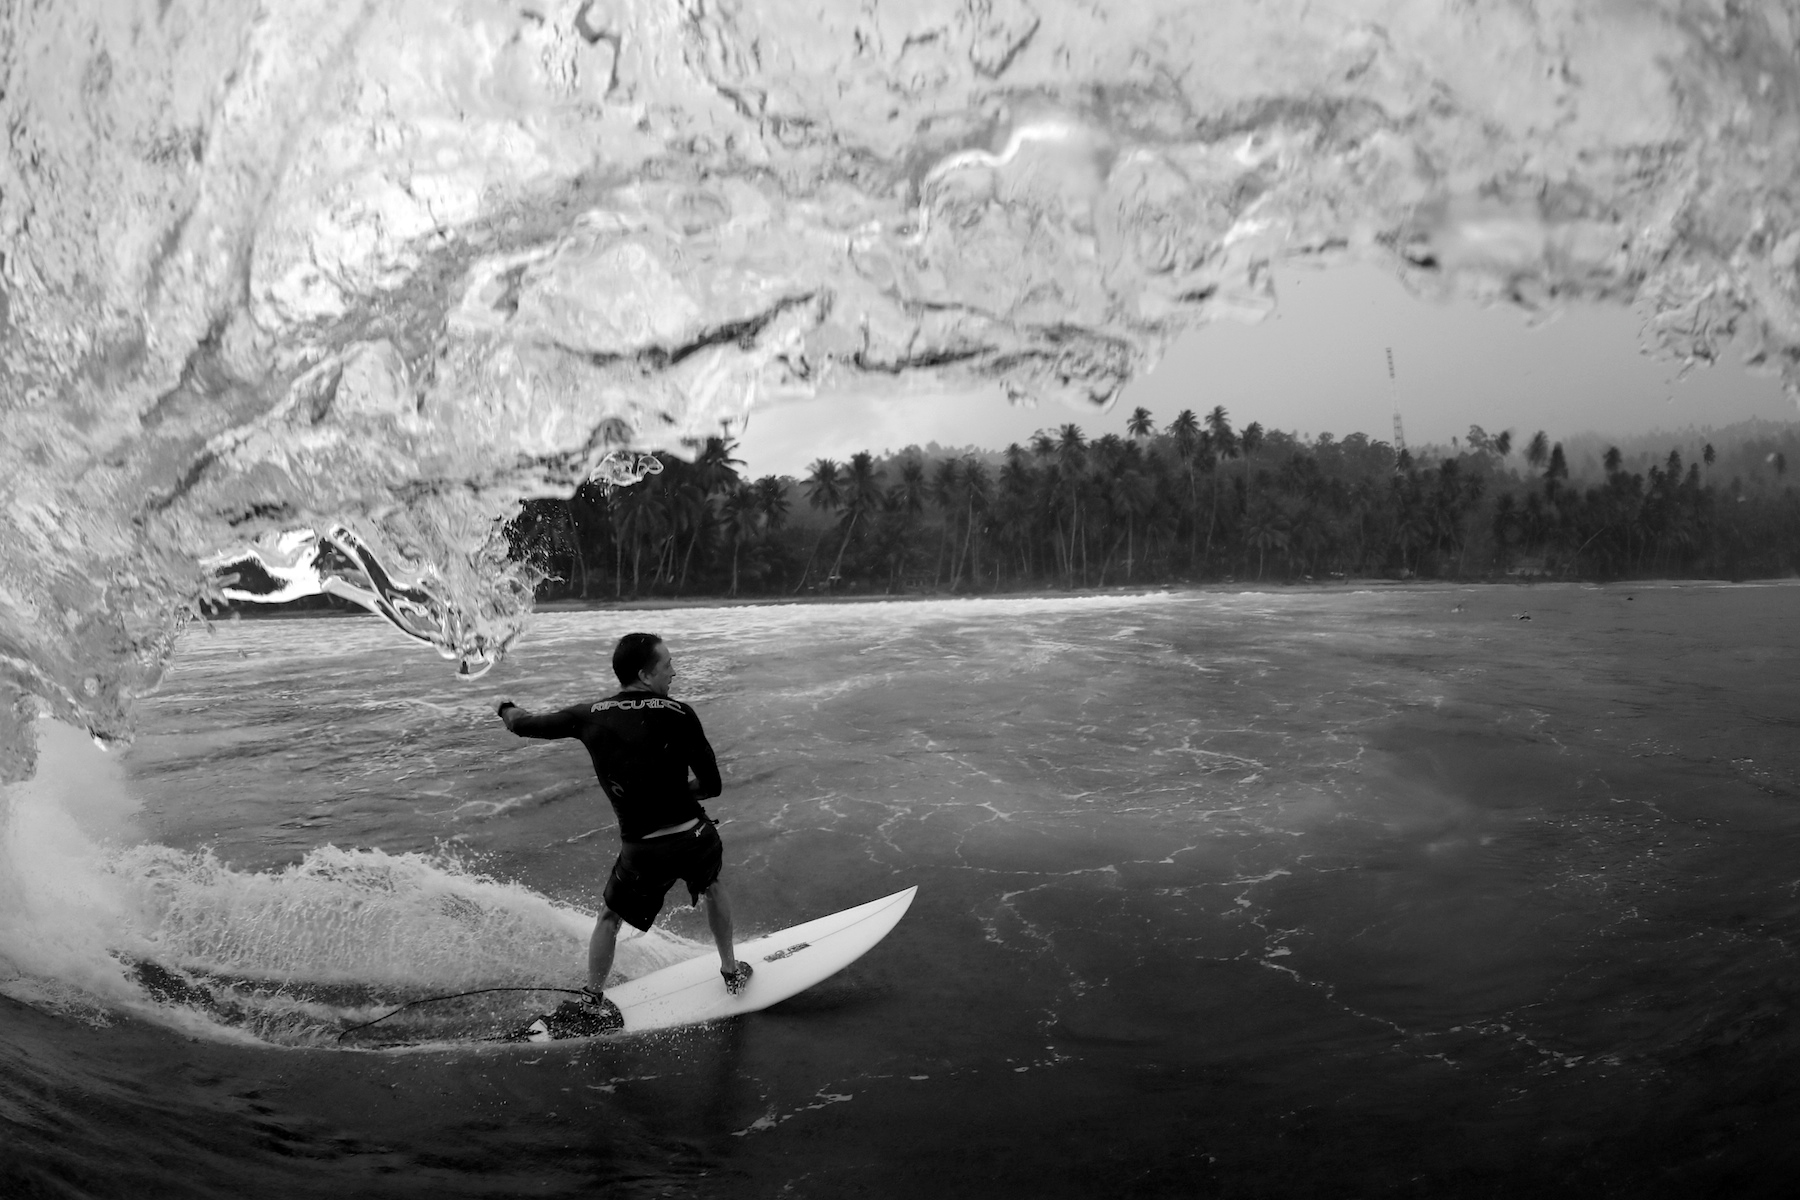 rlz, resort, surfing, Sumatra, Indonesia, Telo Islands, Bali, latitude zero, surf report, family friendly